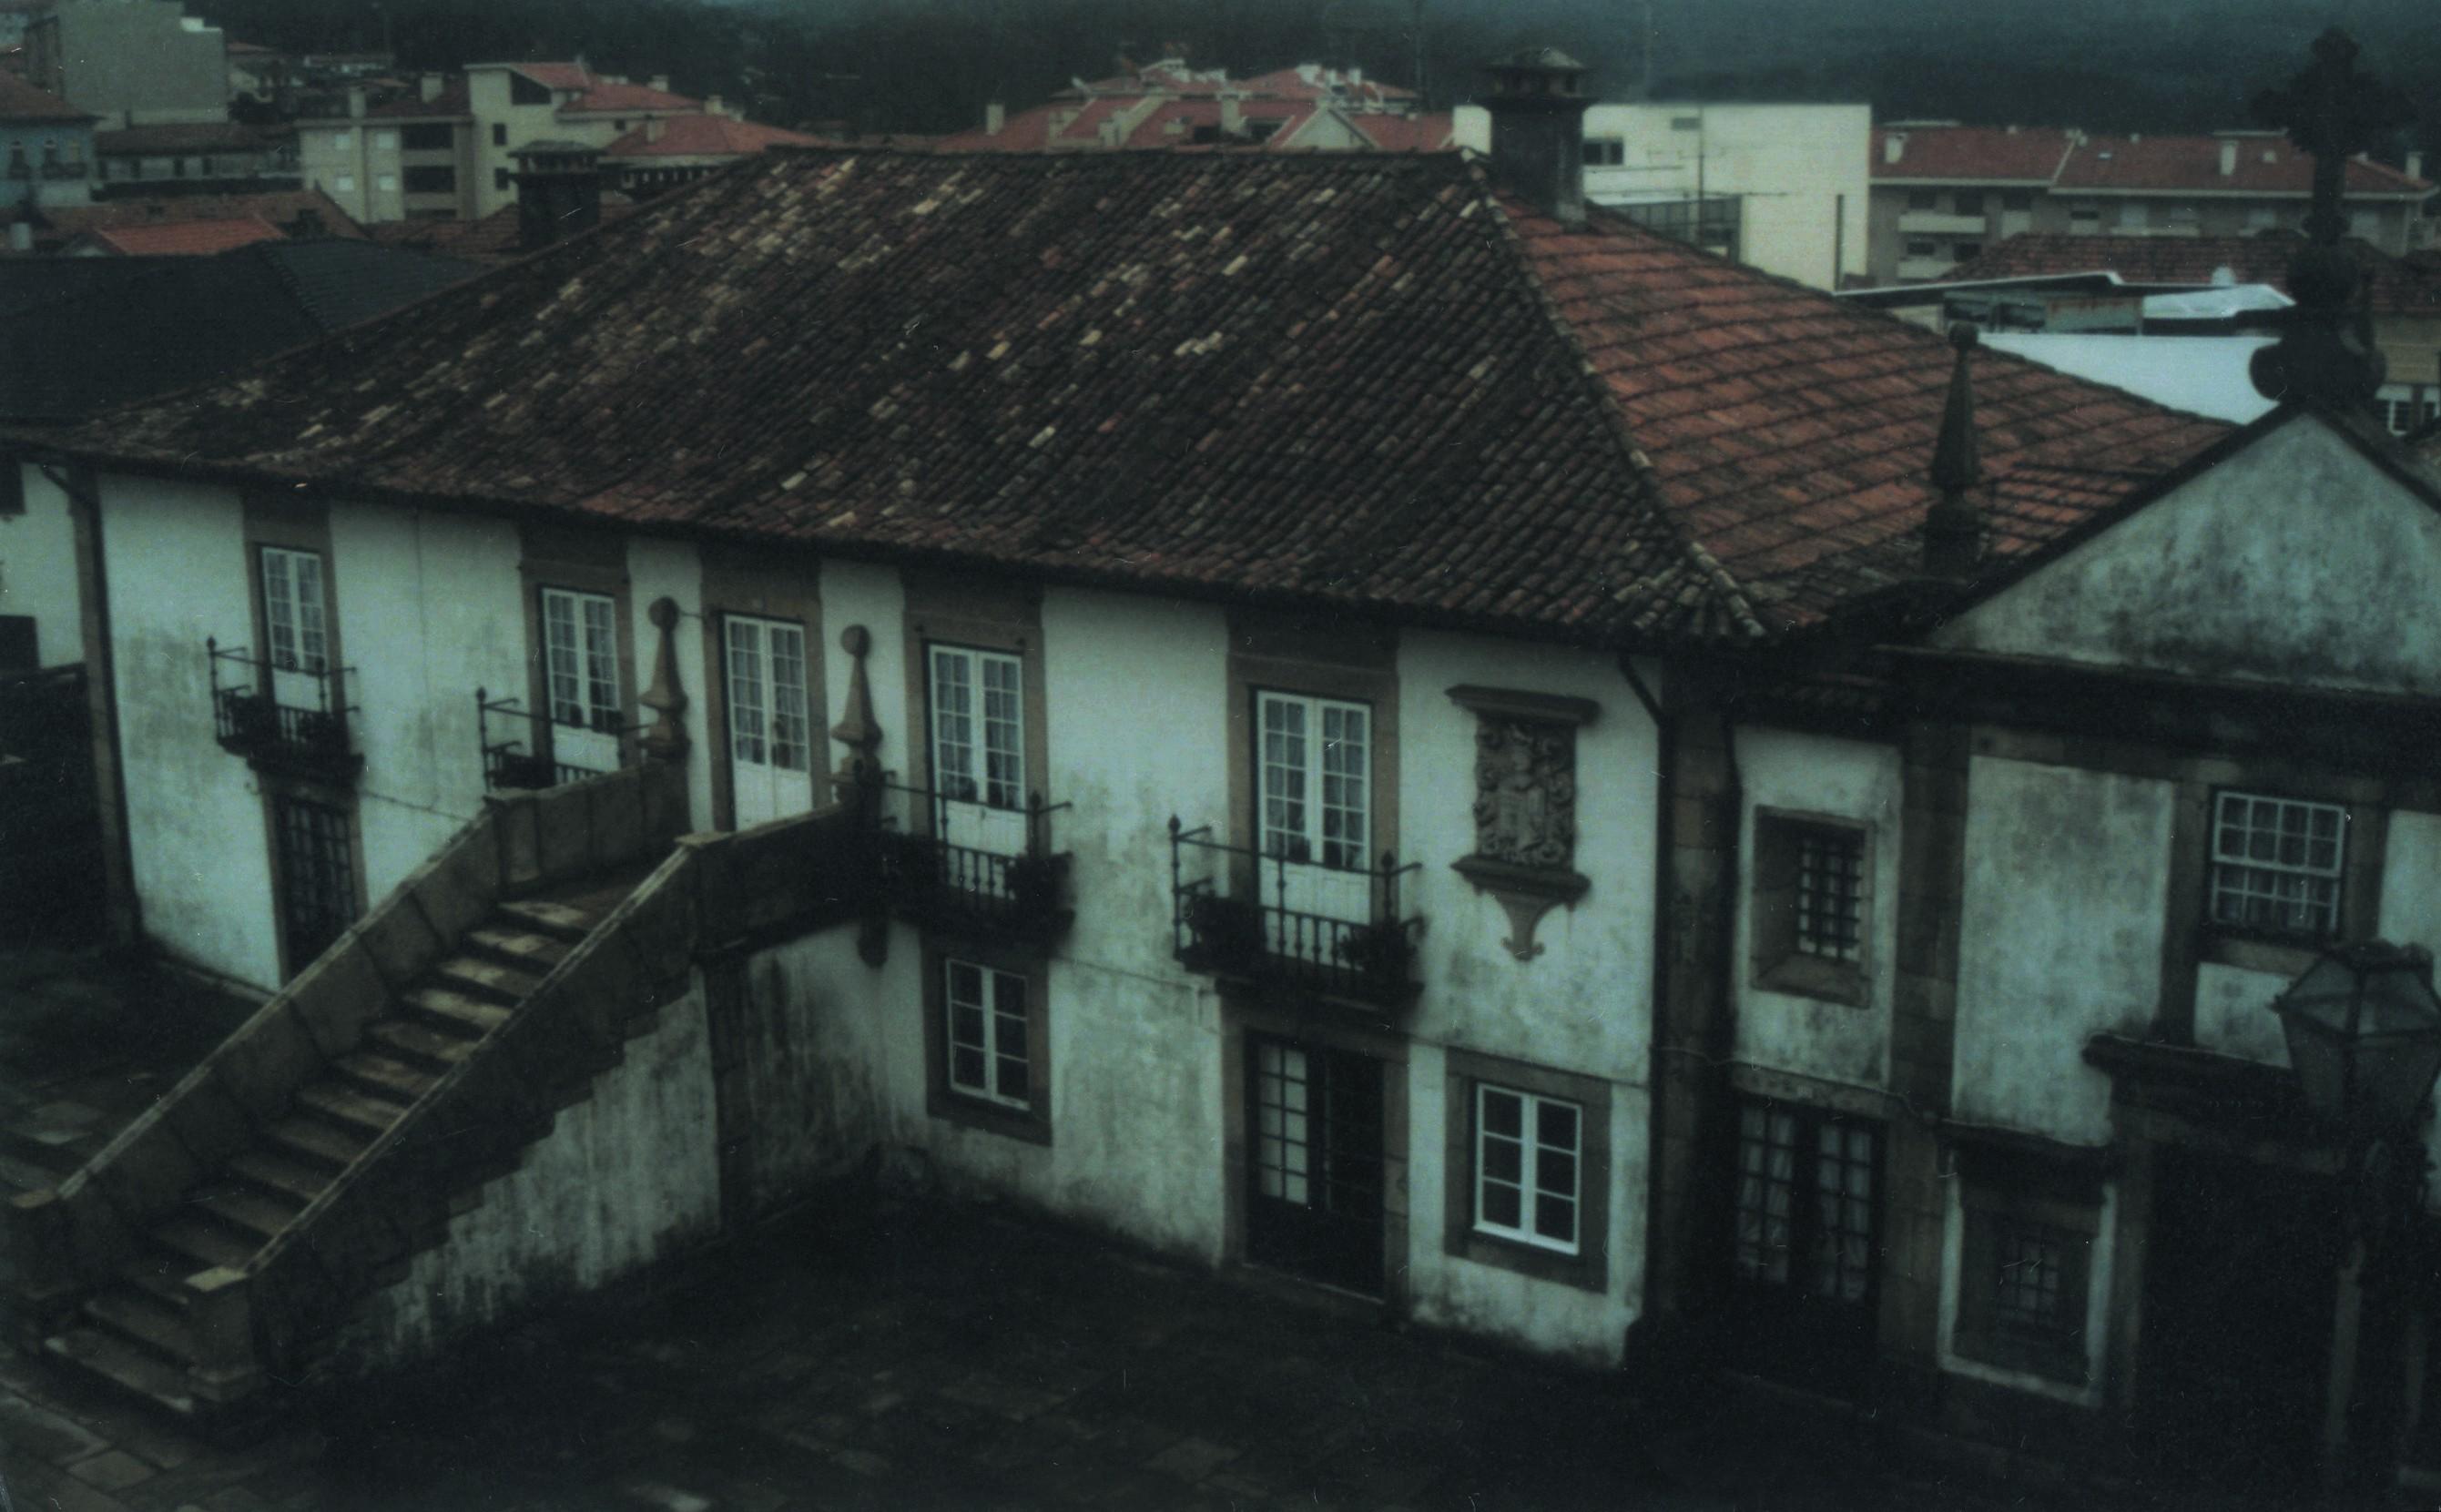 Solar da família Corte Real (1995)